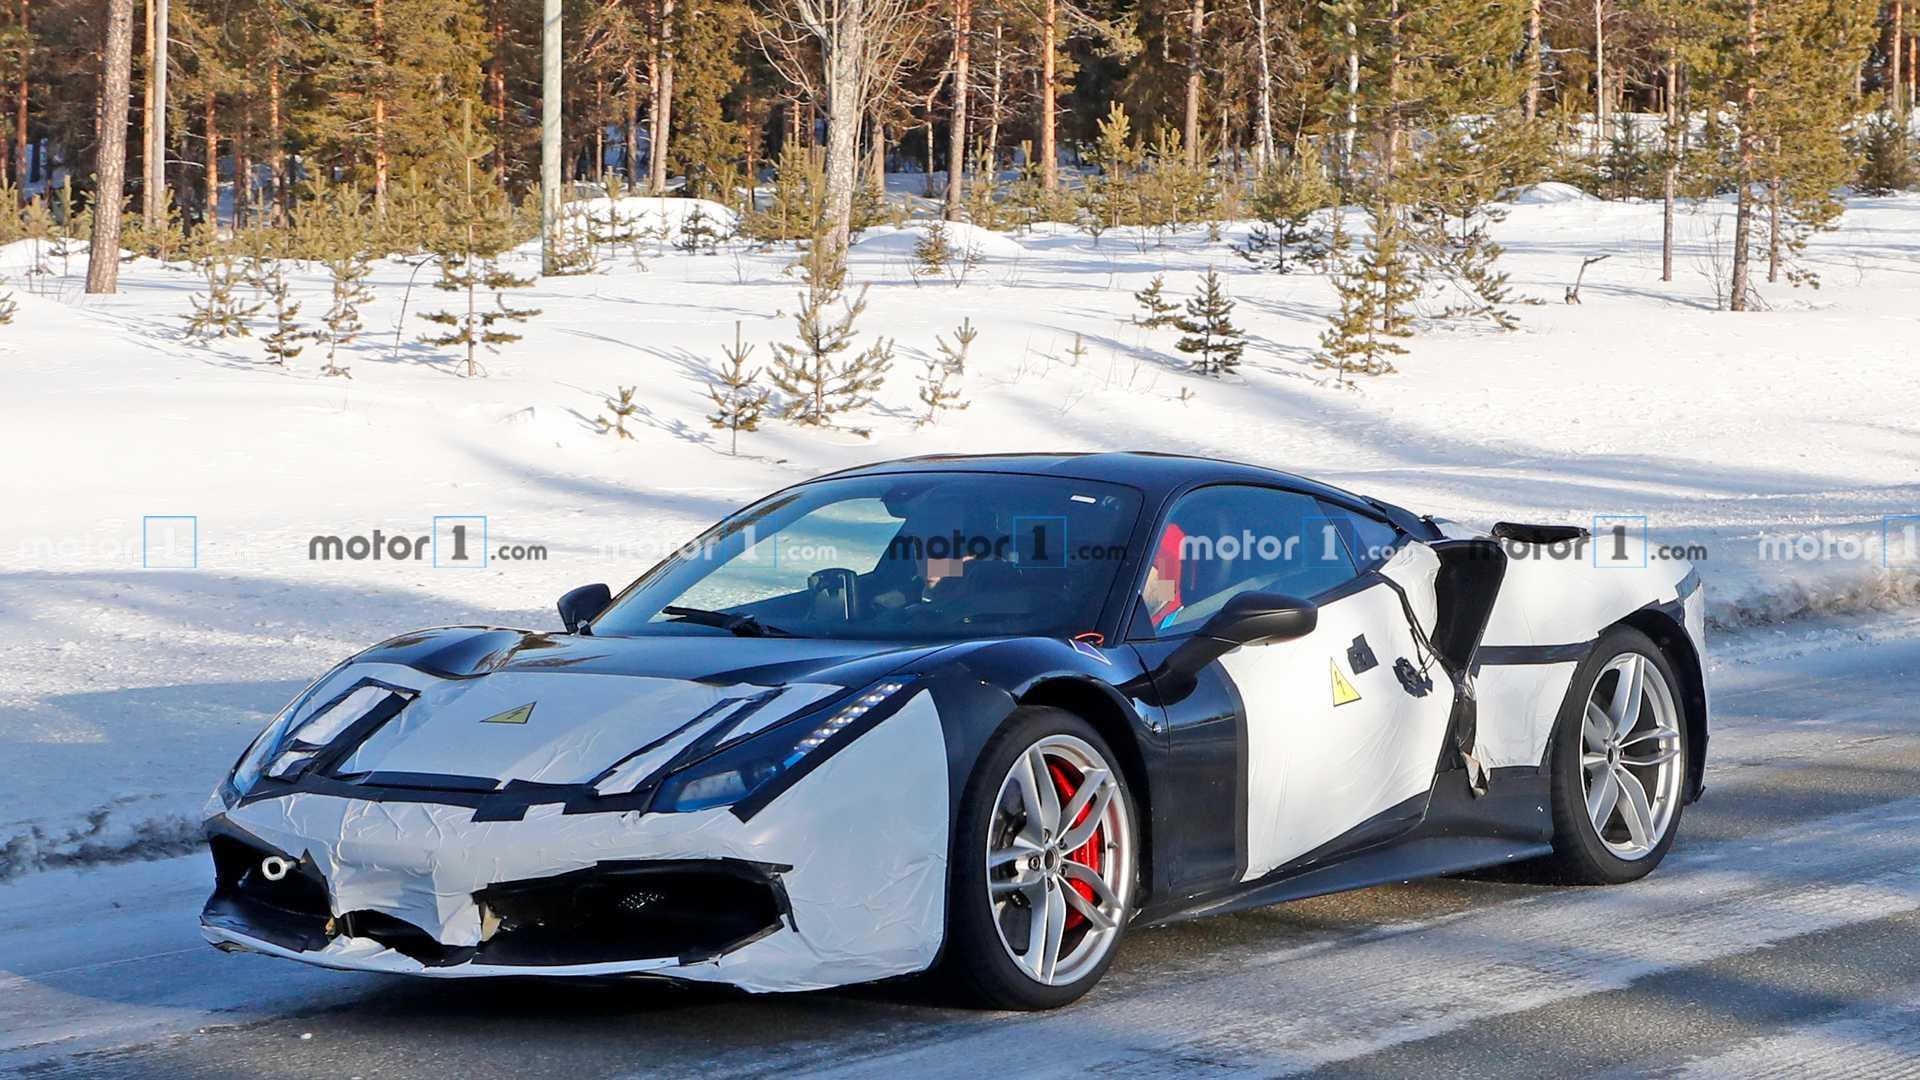 На тестах замечен необычный прототип суперкара Ferrari 488